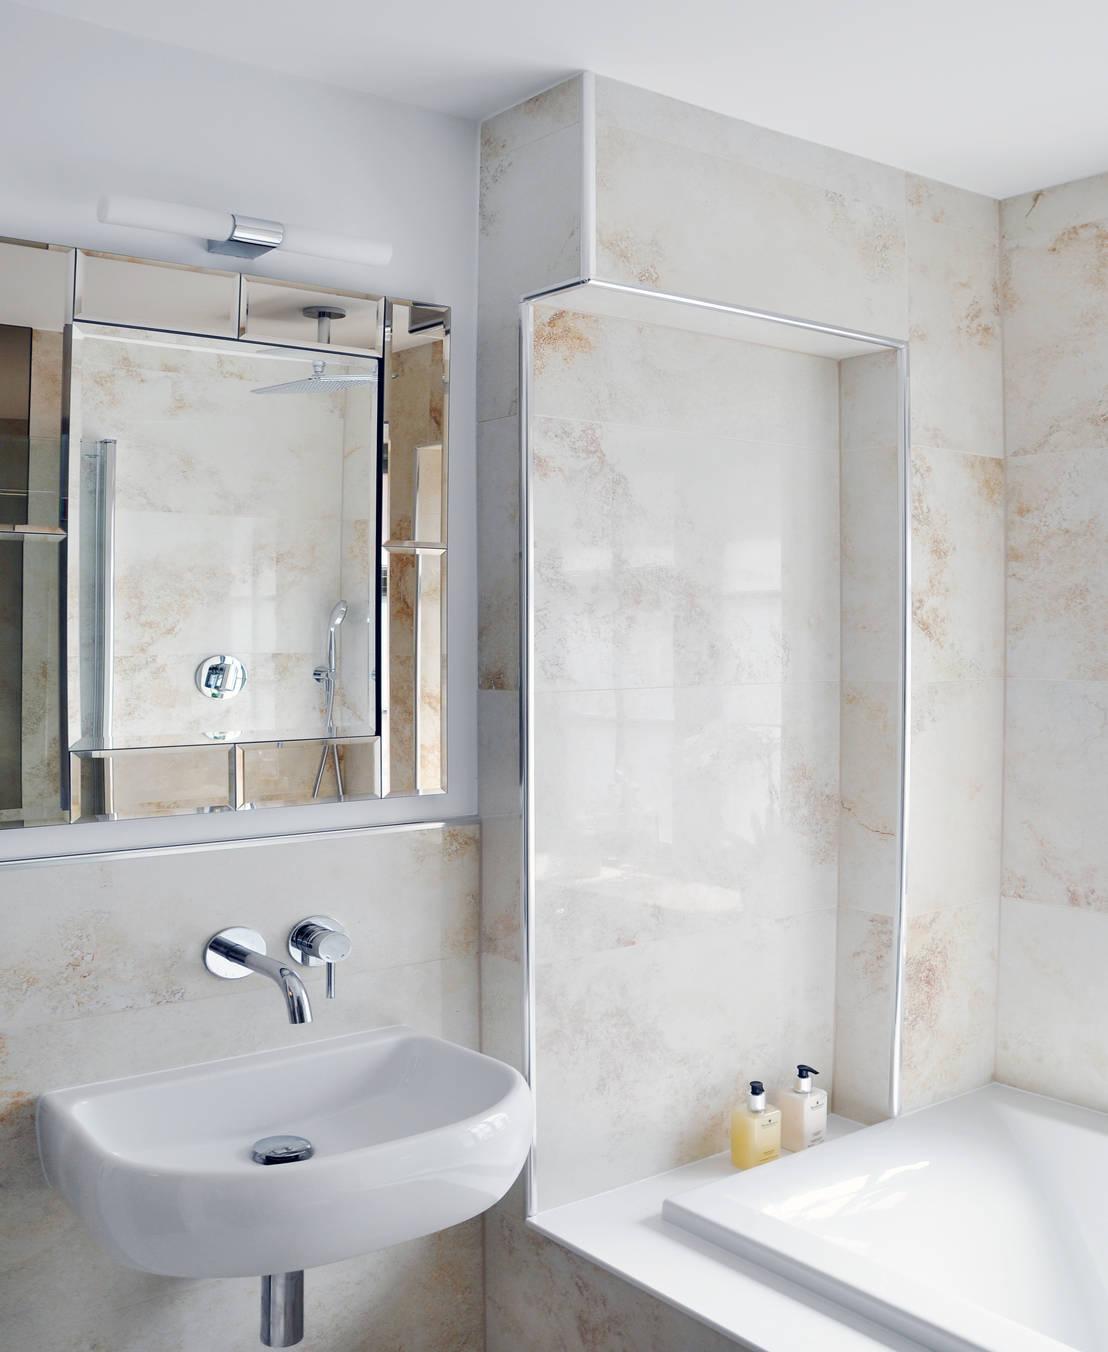 bathrooms redesign by studio to homify small bathroom scandinavian bathroom interior design